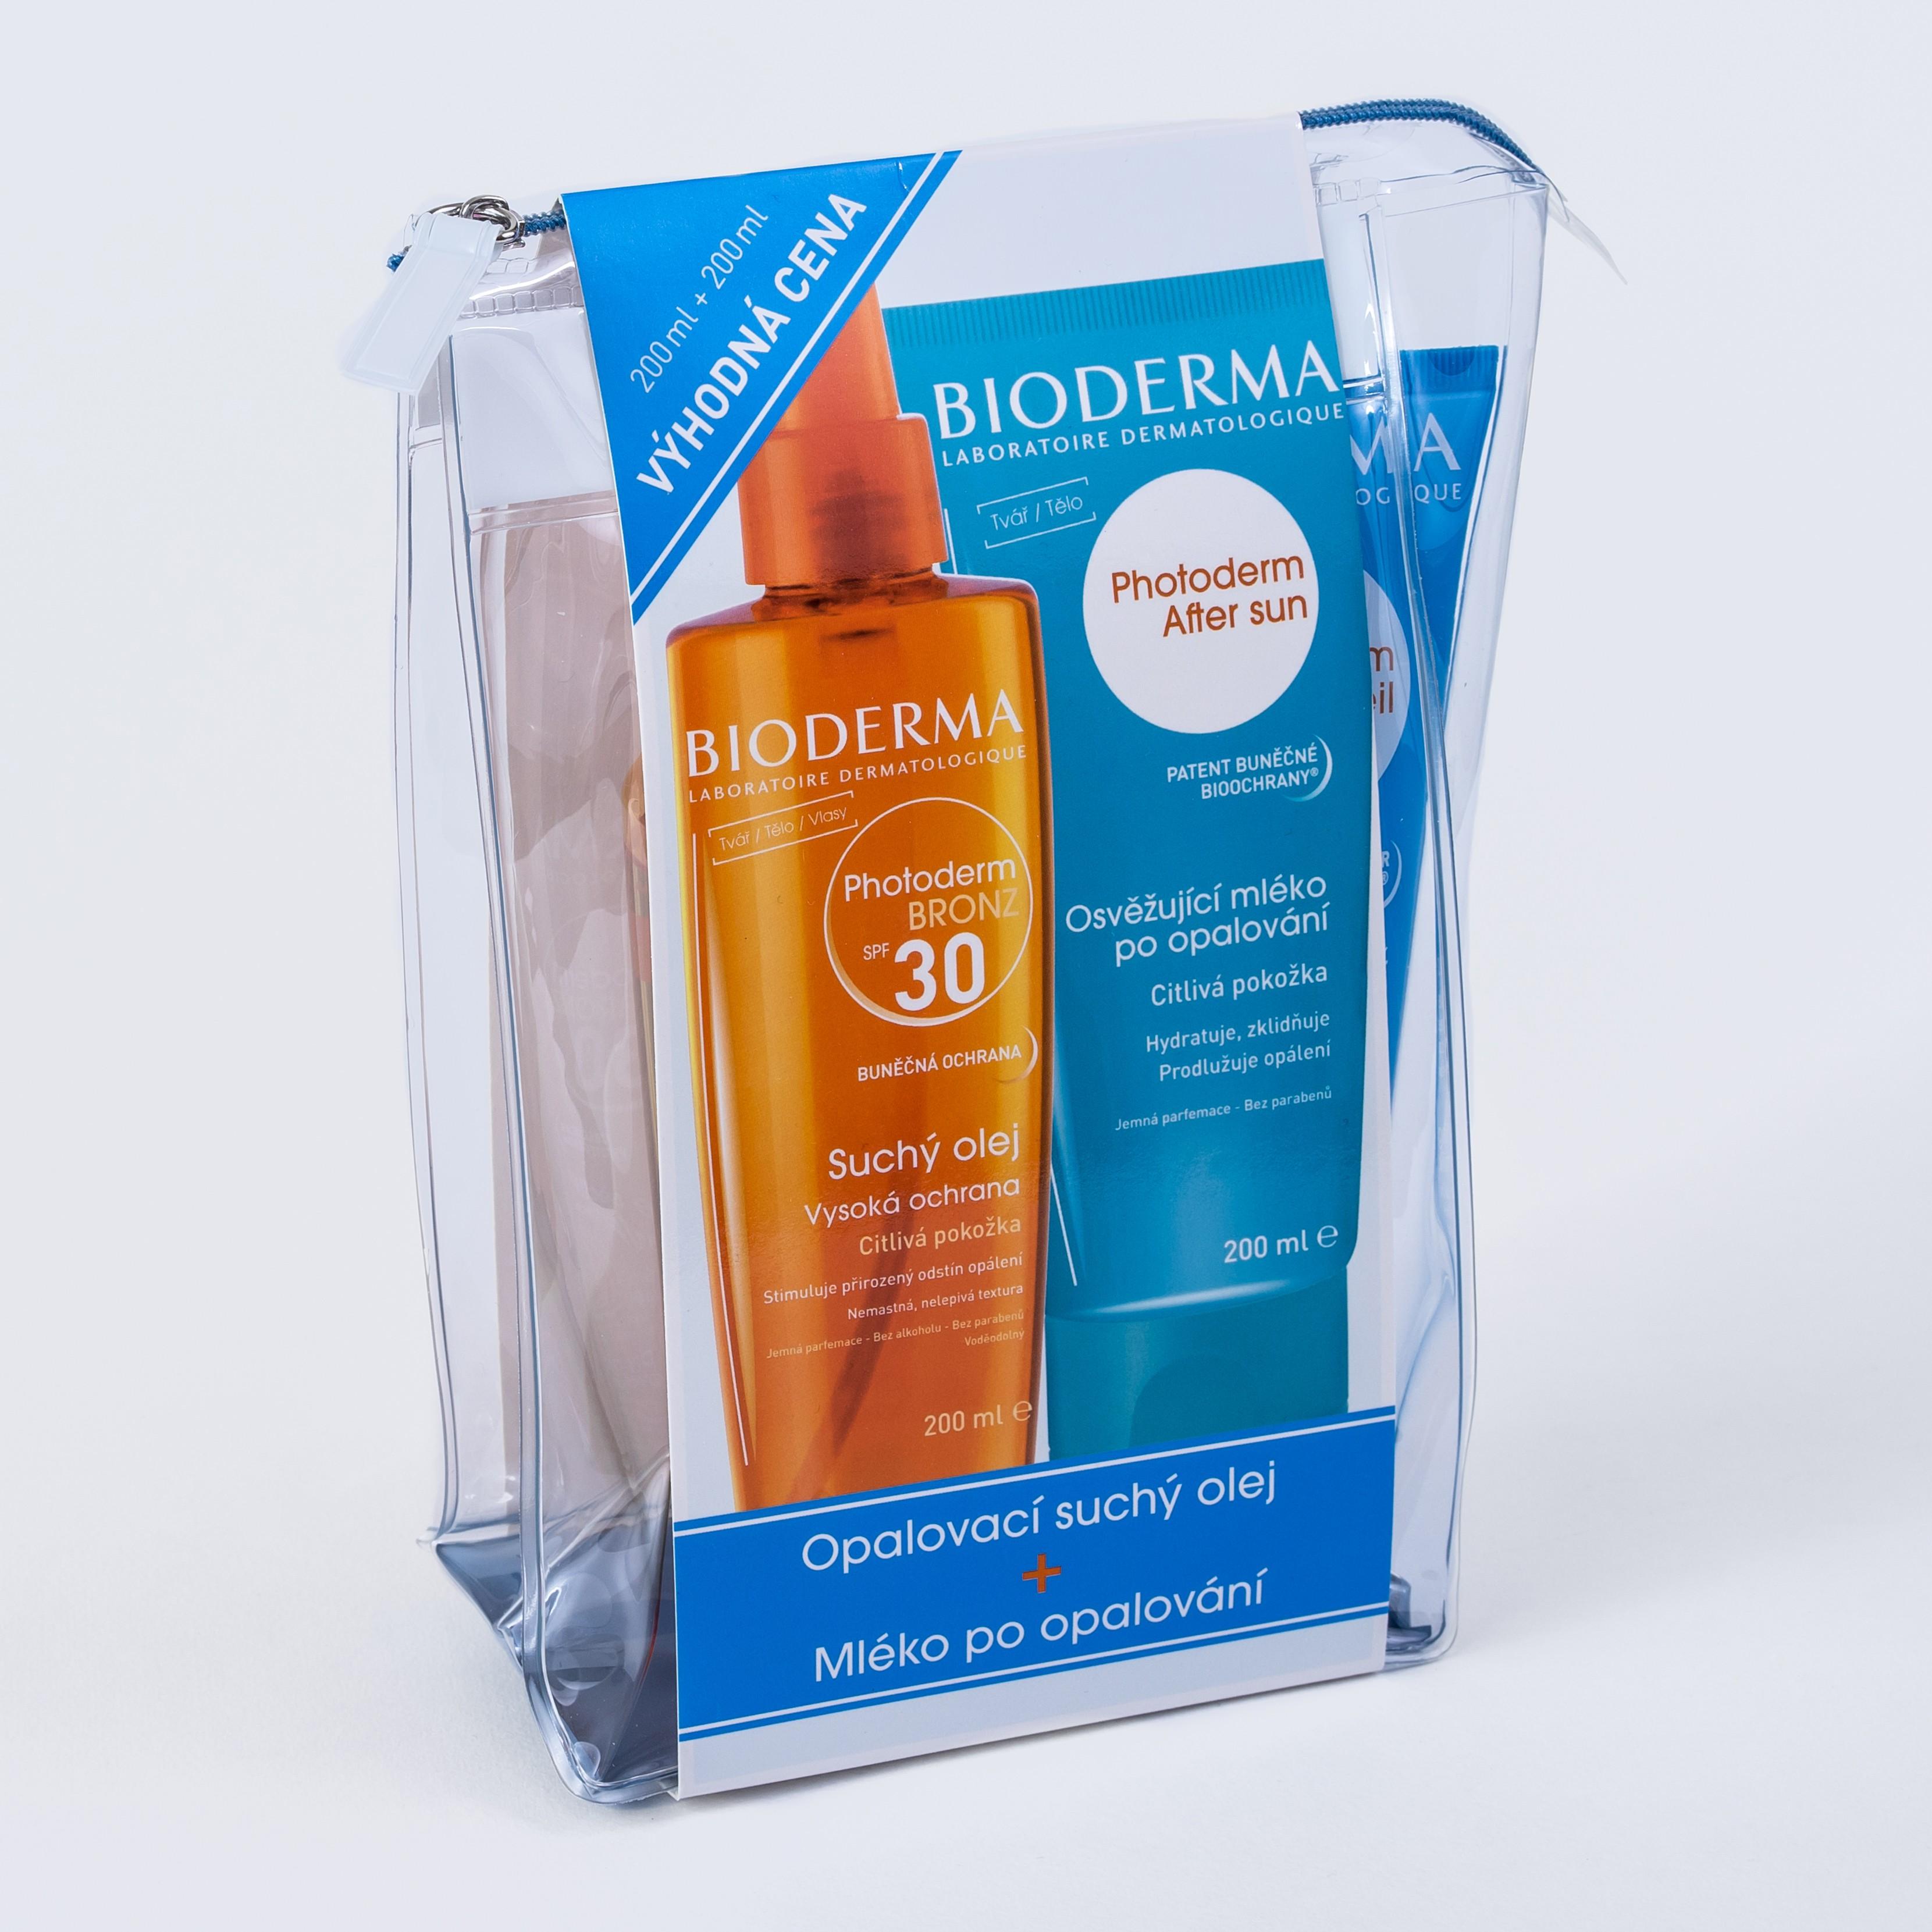 BIODERMA Photoderm Photoderm SPF30 Bronz olej 200ml plus ZDARMA Photoderm After sun 200ml